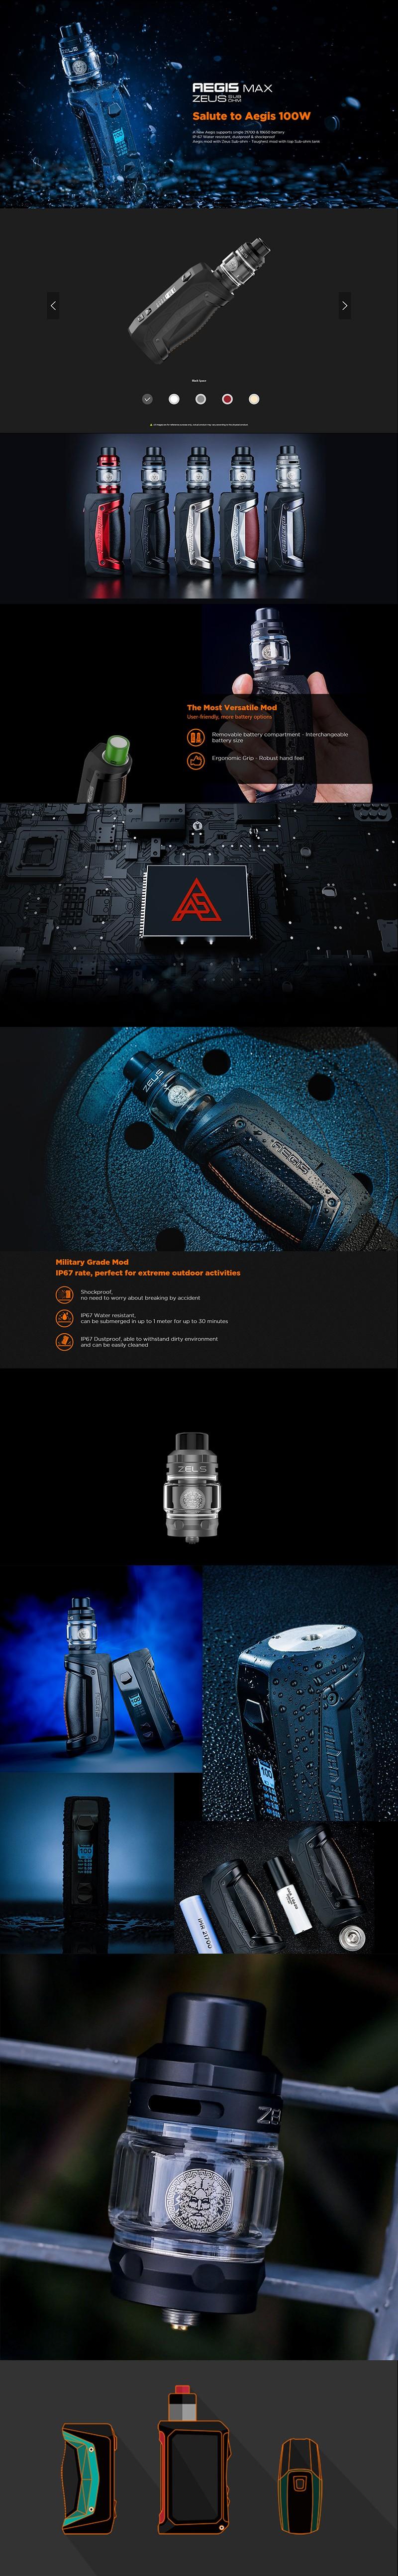 GeekVape Aegis Max 100W TC VW Mod Vape Starter Kit w/ Zeus Tank